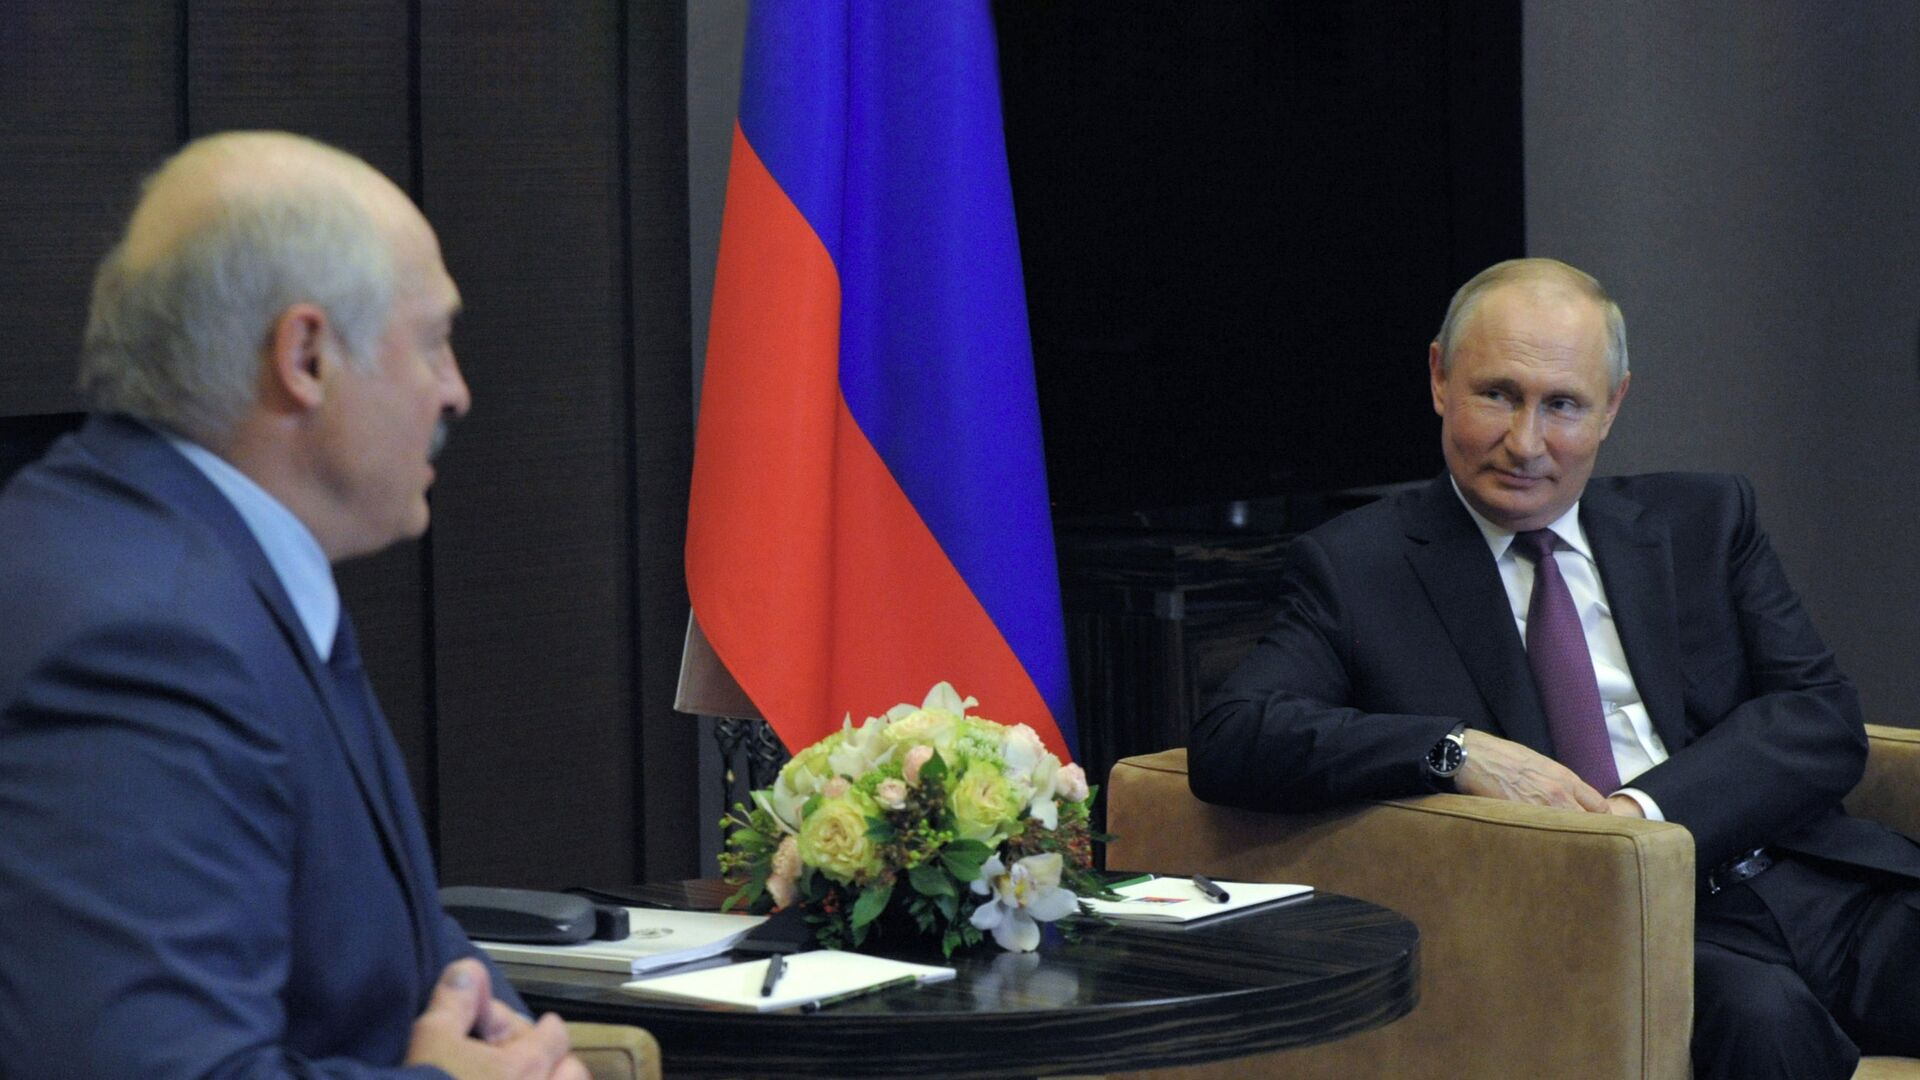 Президент РФ Владимир Путин и президент Белоруссии Александр Лукашенко во время встречи - РИА Новости, 1920, 13.07.2021